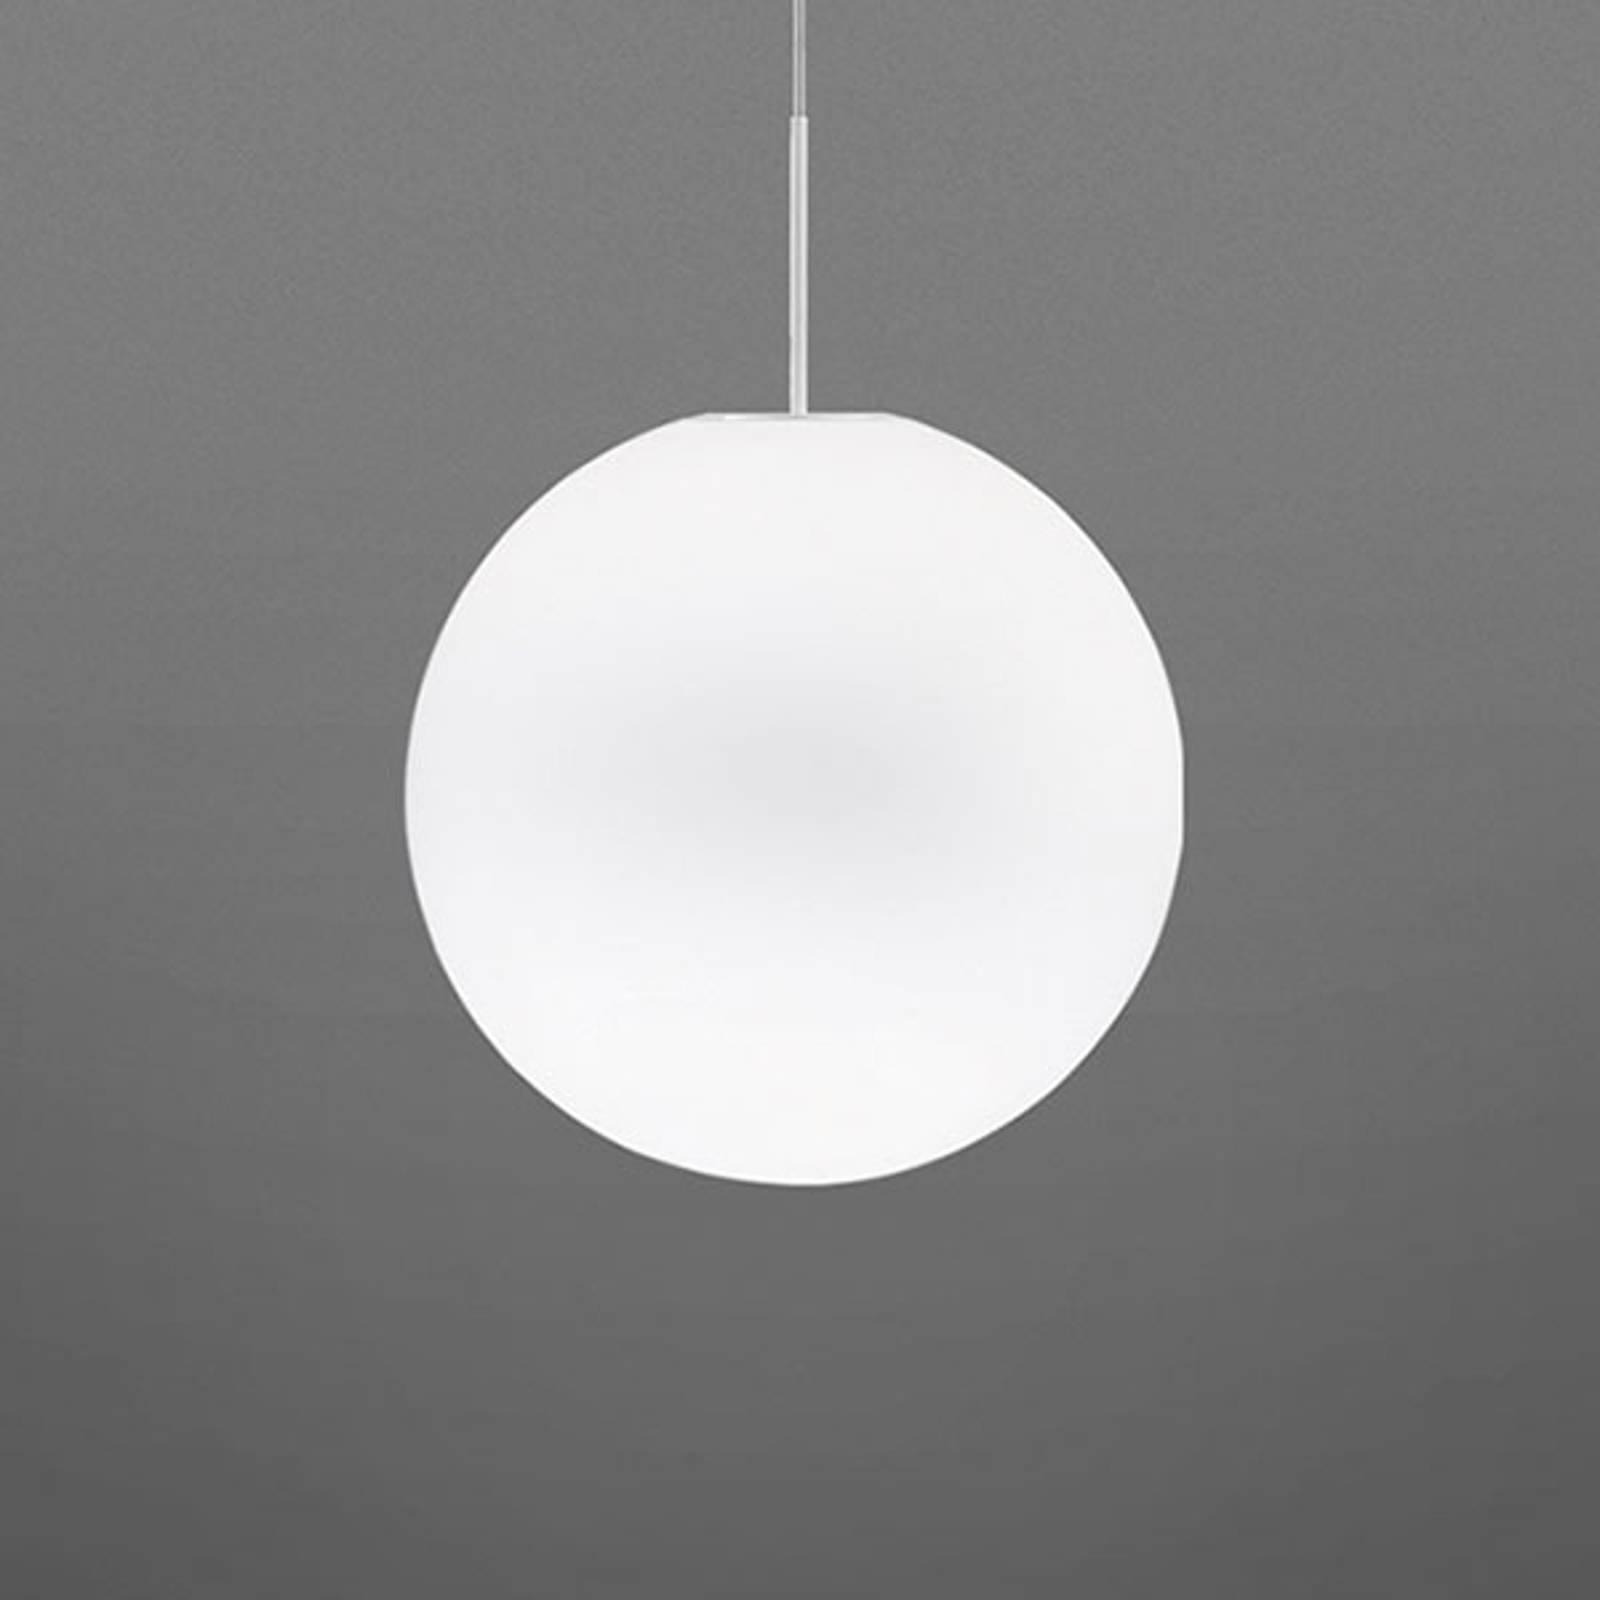 Fabbian Lumi Sfera glazen hanglamp, Ø 20 cm